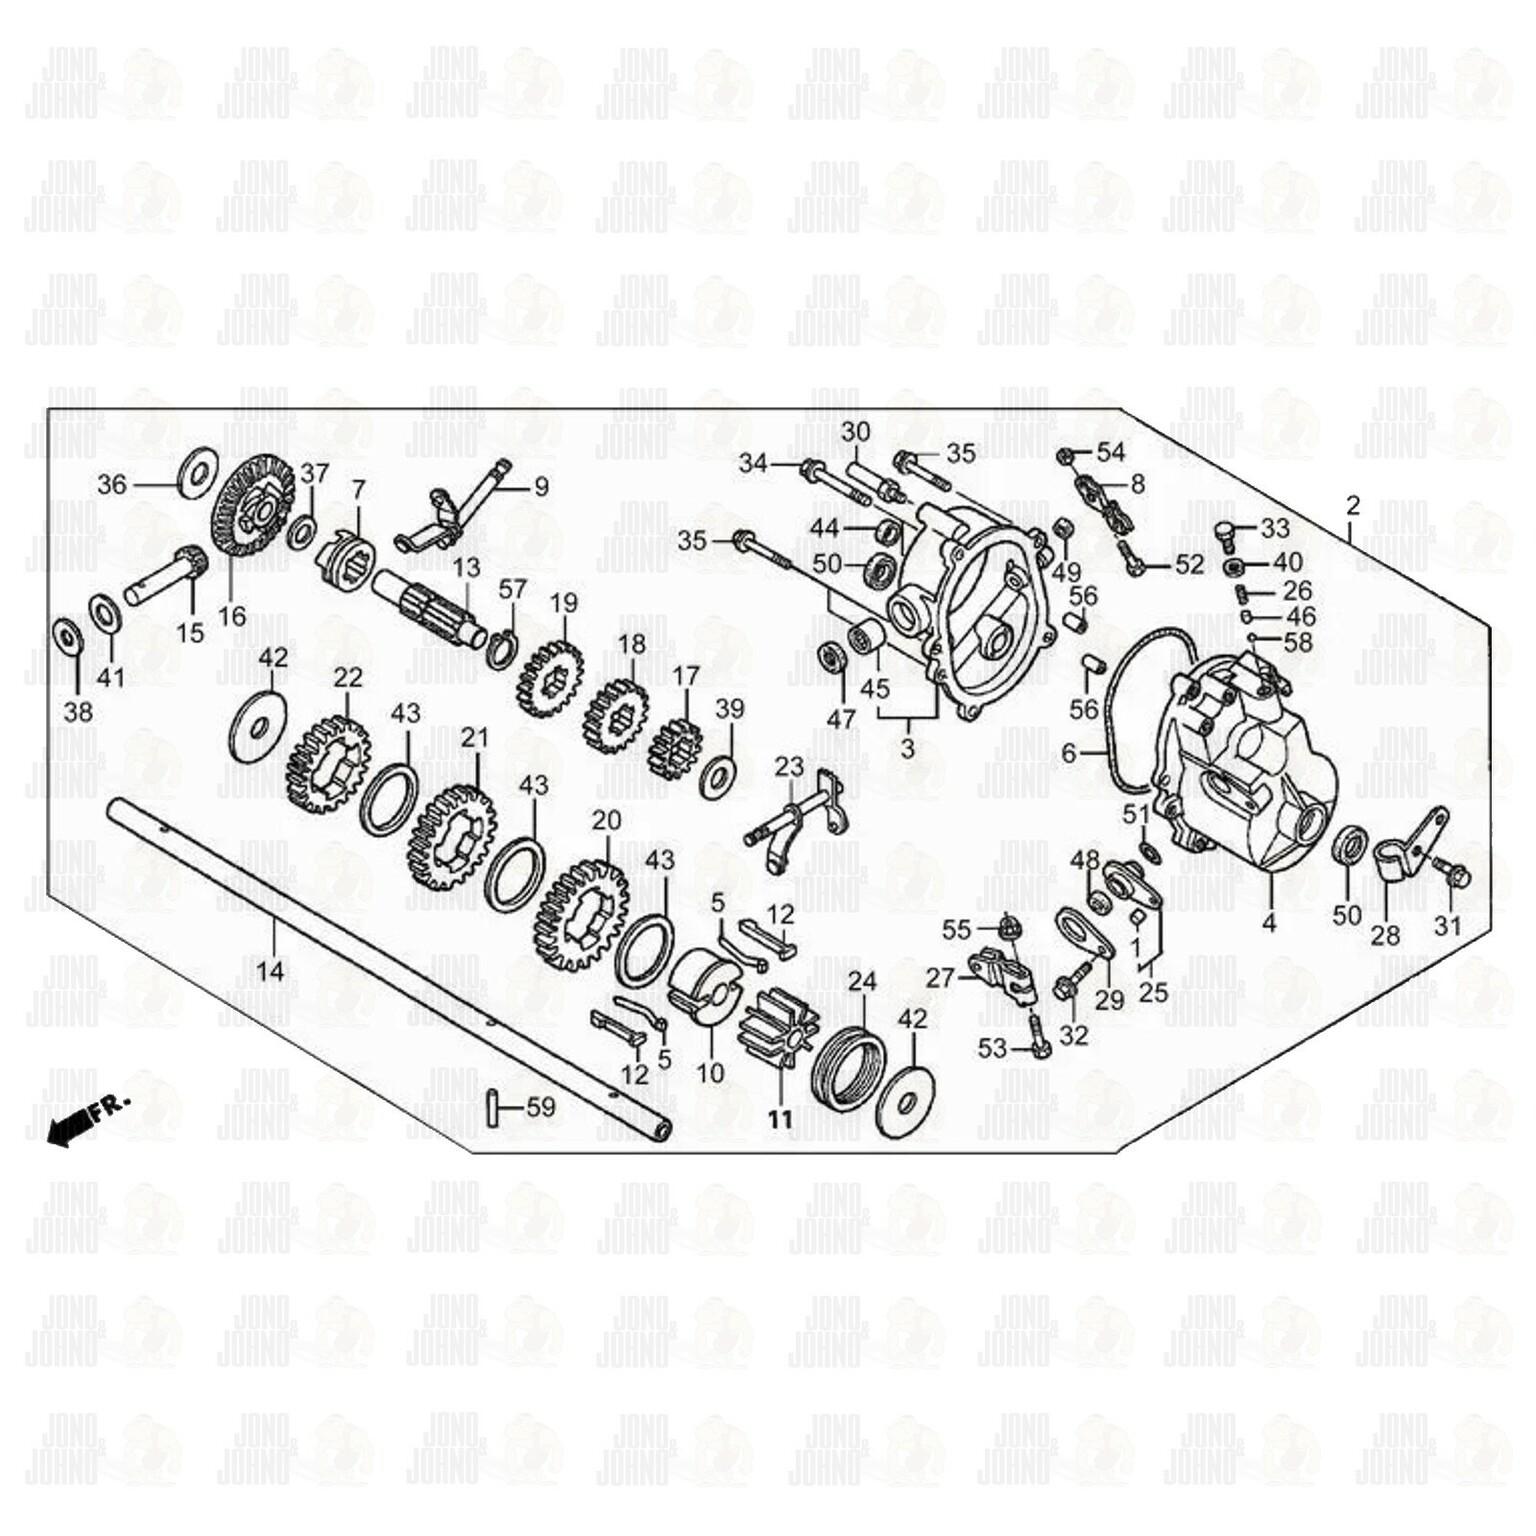 hight resolution of honda mower transmission diagram wiring diagrams wni honda mower transmission parts honda mower transmission diagram